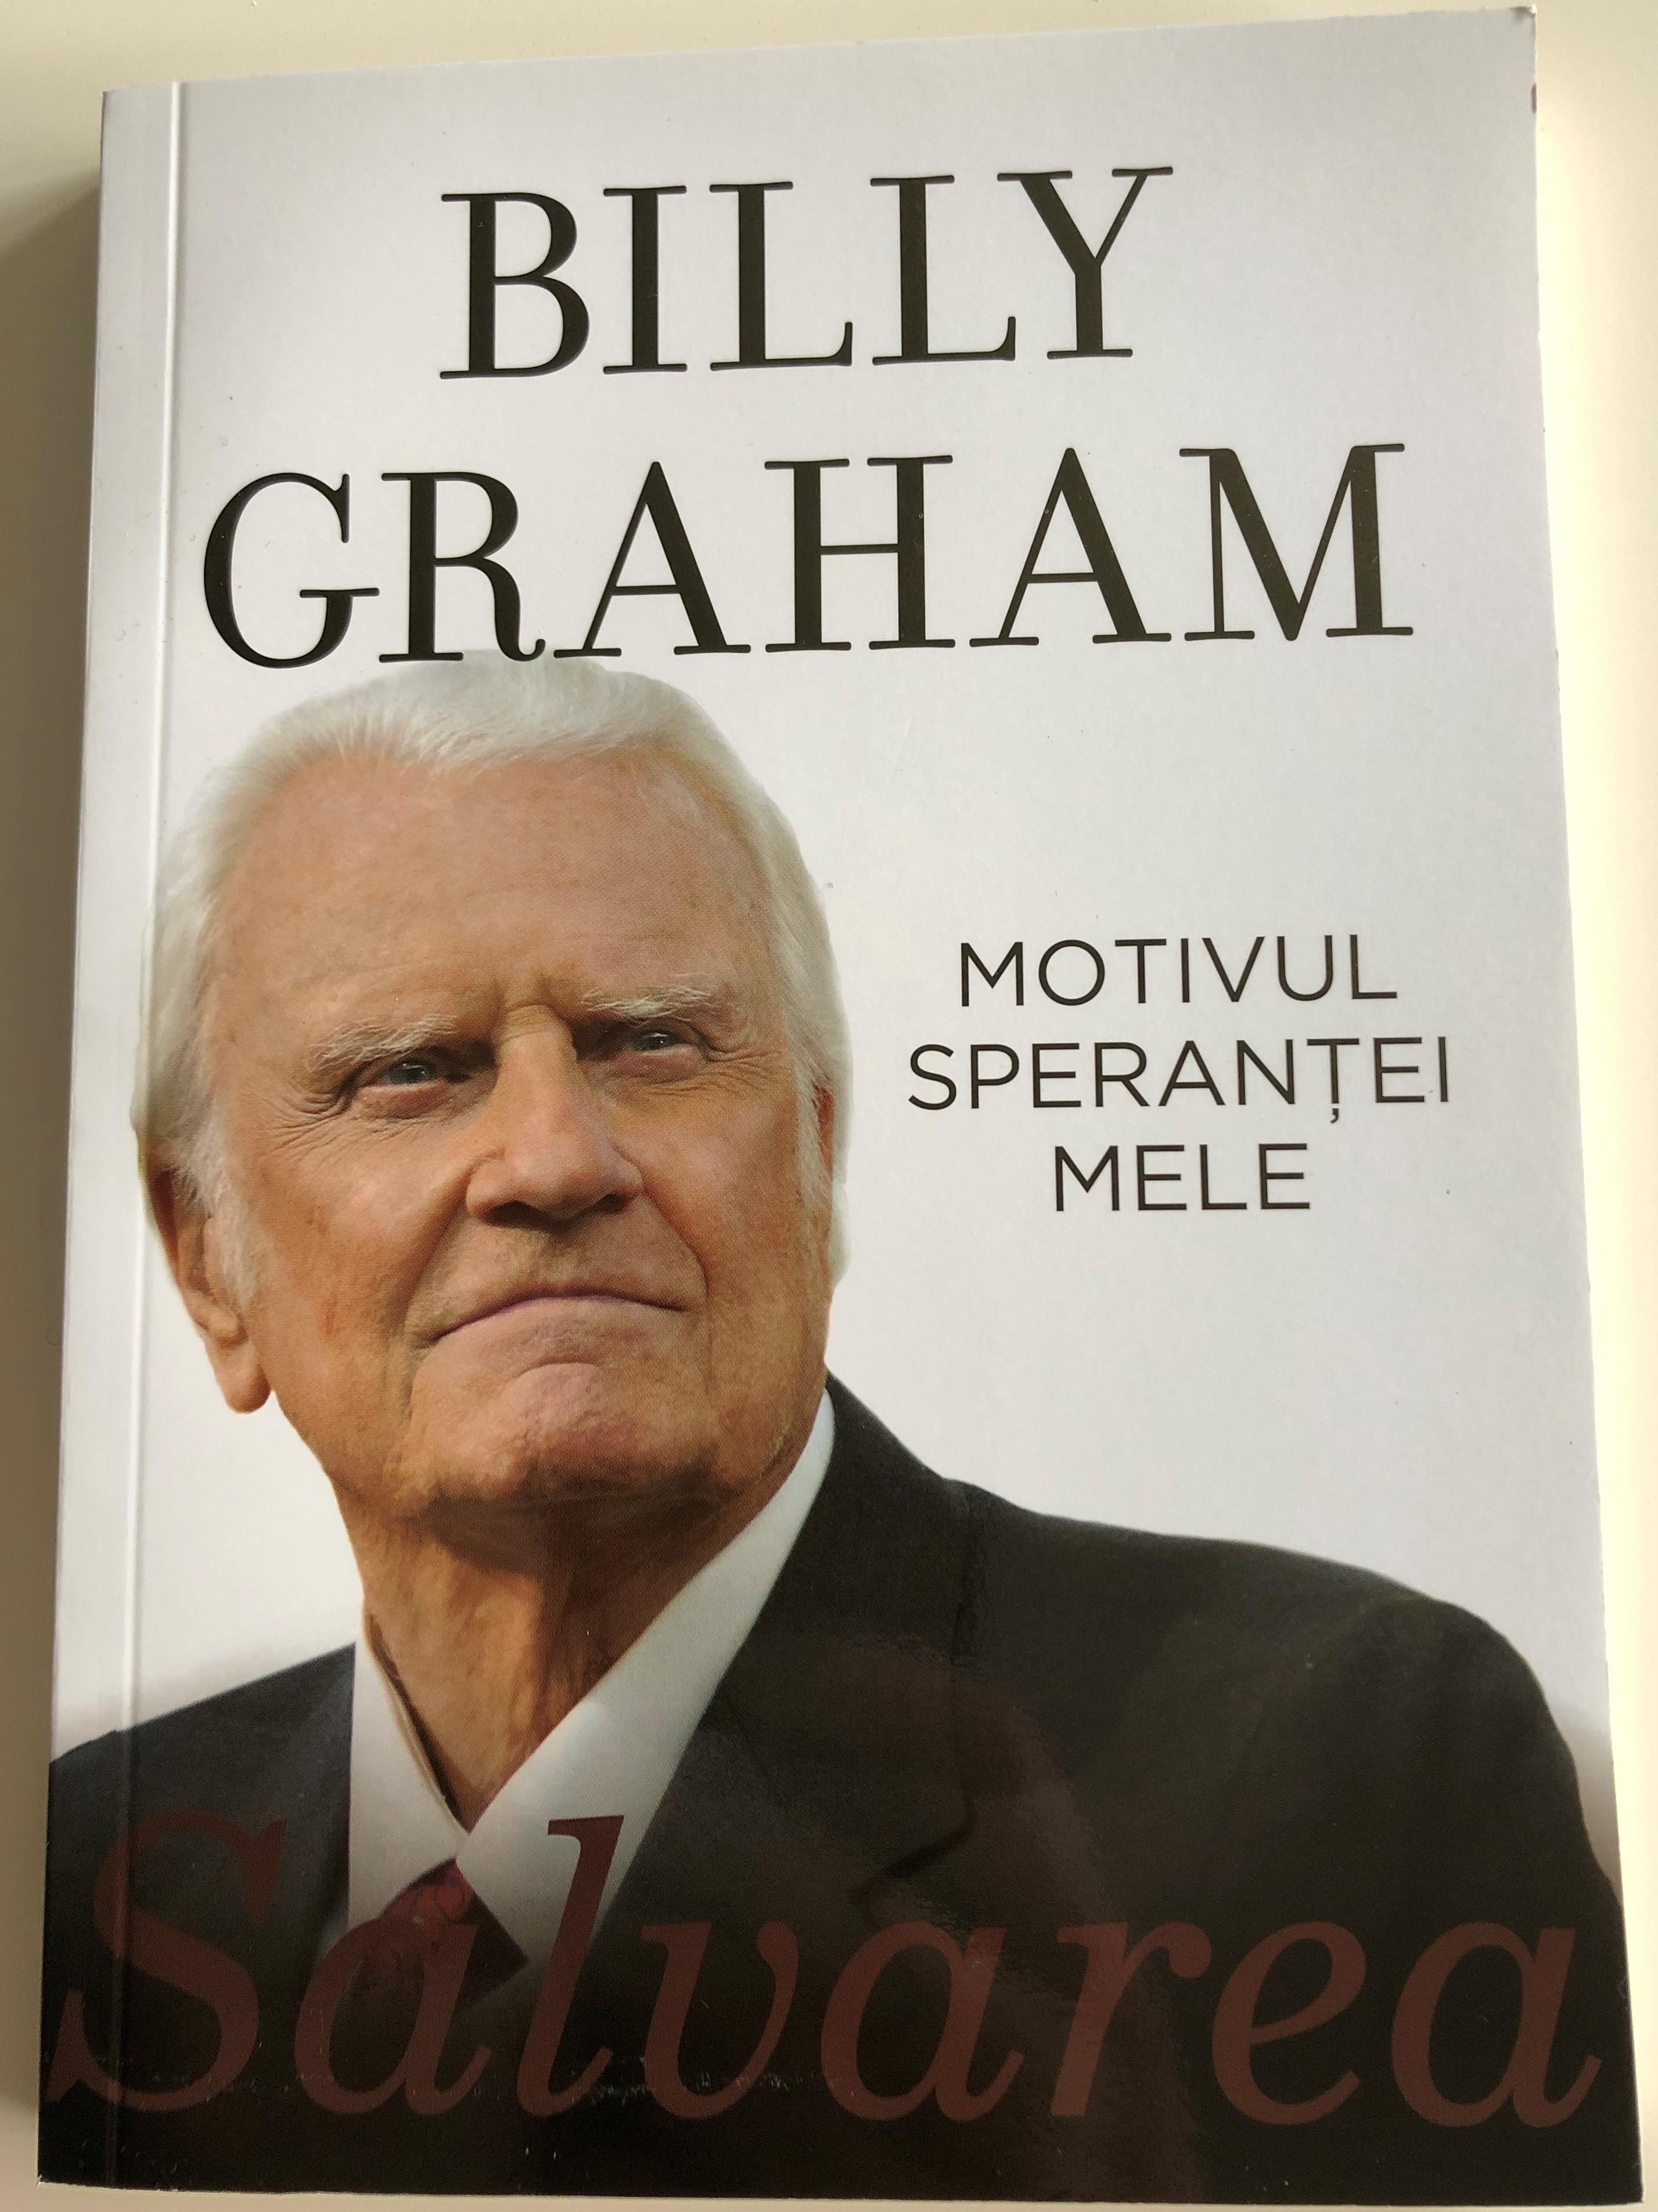 motivul-sperantei-mele-salvarea-by-billy-graham-romanian-translation-of-the-reason-for-my-hope-salvation-paperback-2014-clc-romania-1-.jpg